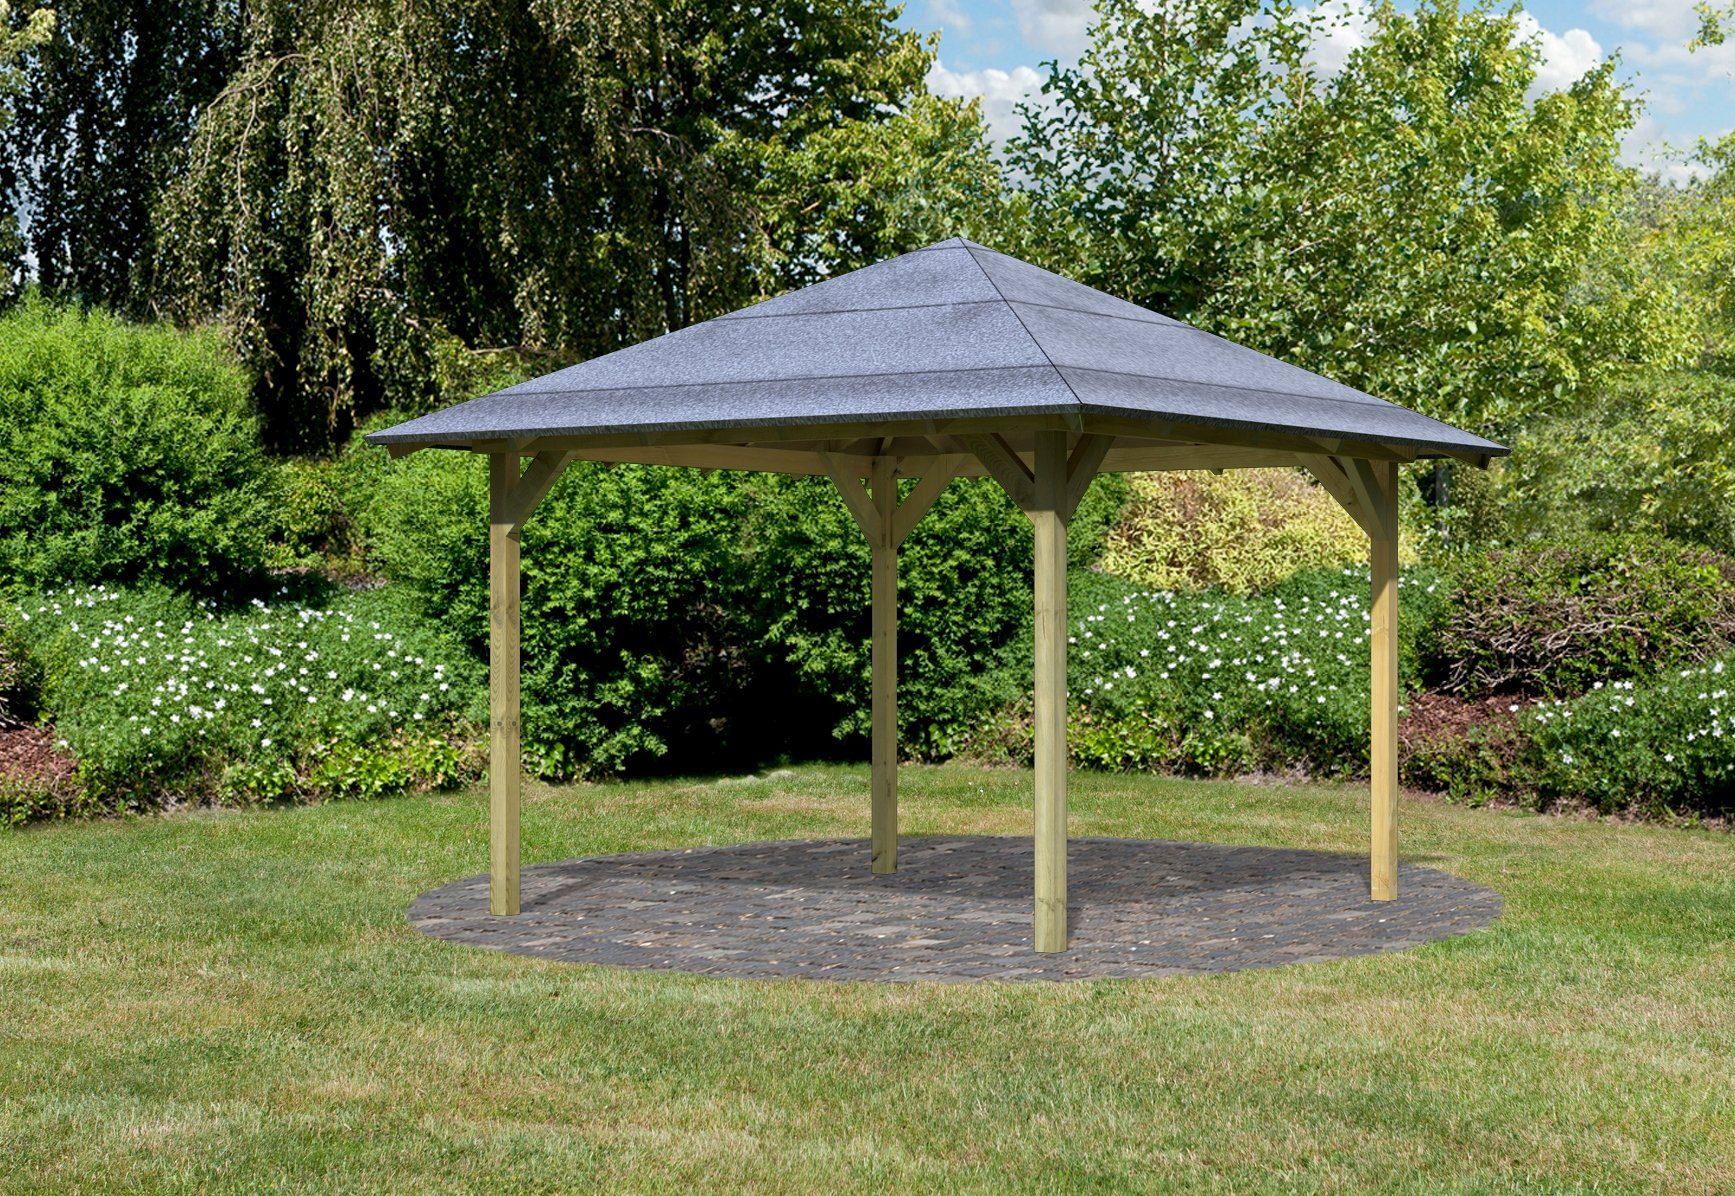 Brandneu Holzpavillon online kaufen » Pavillon aus Holz | OTTO BL65